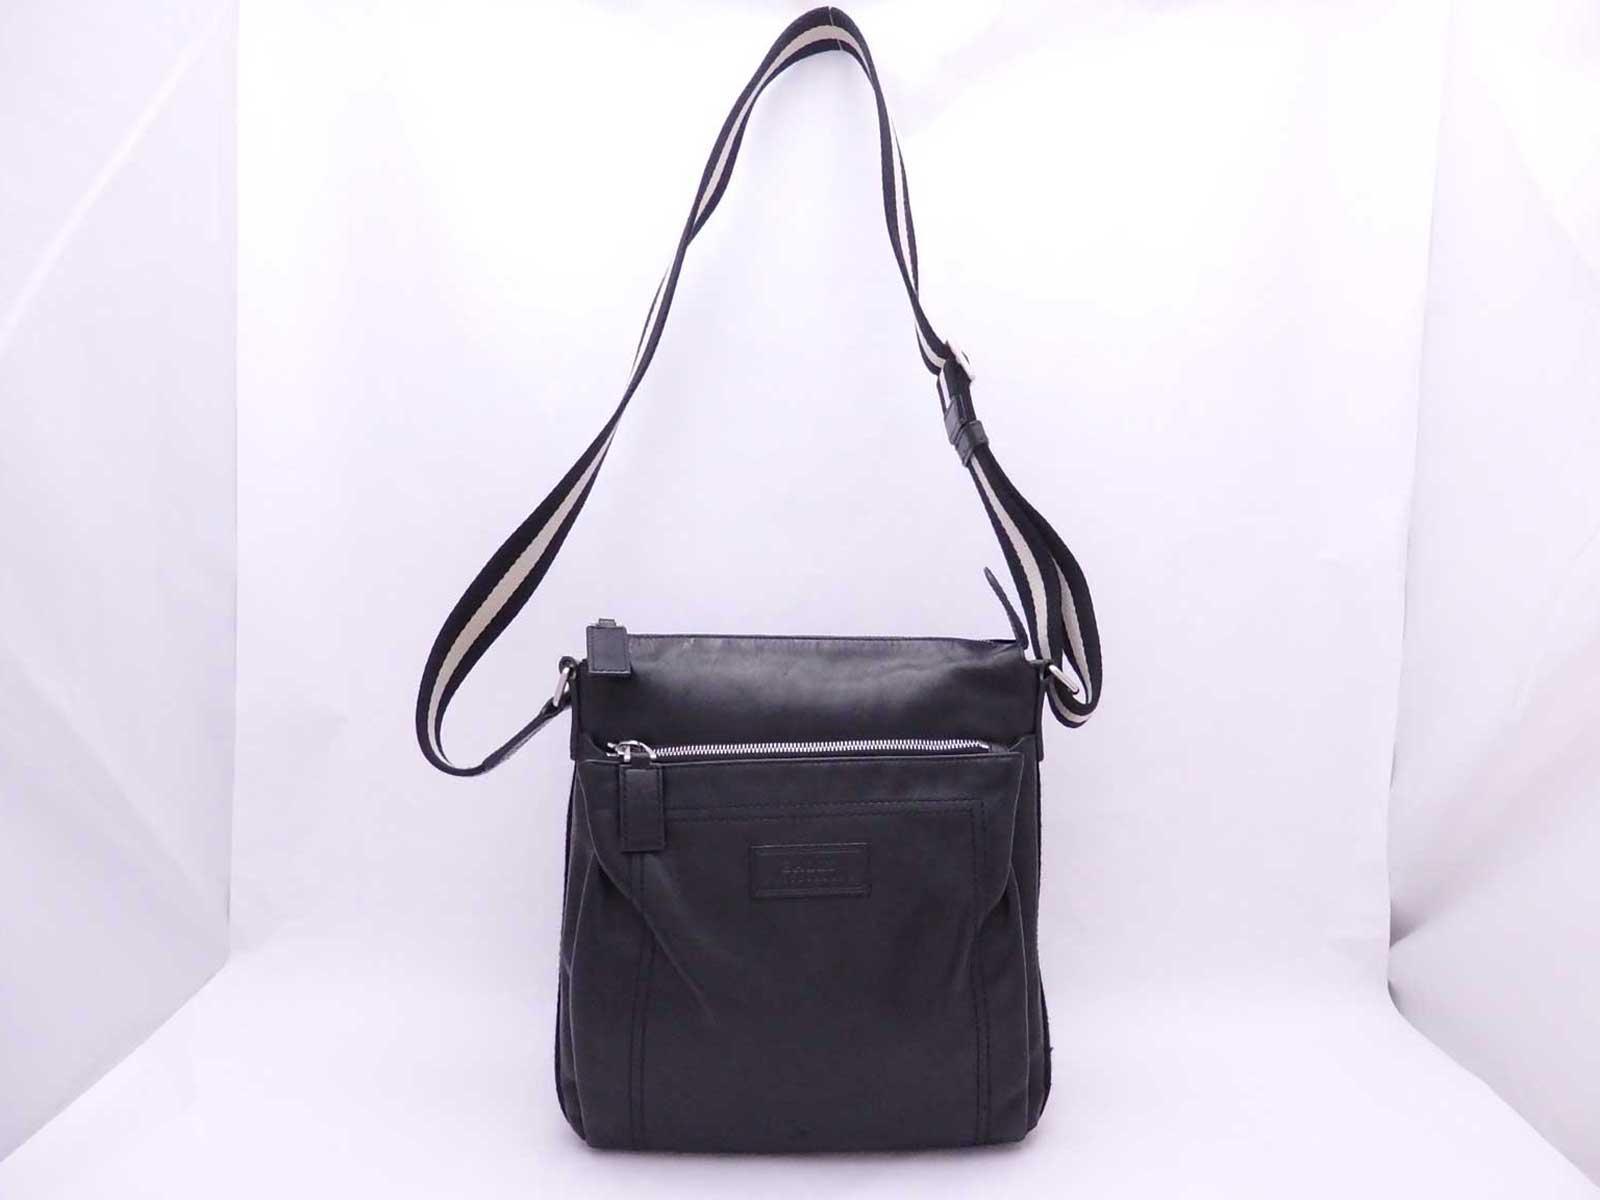 a06b995ee1b Auth BALLY Logos Crossbody Shoulder Bag Black/White Leather/Canvas ...